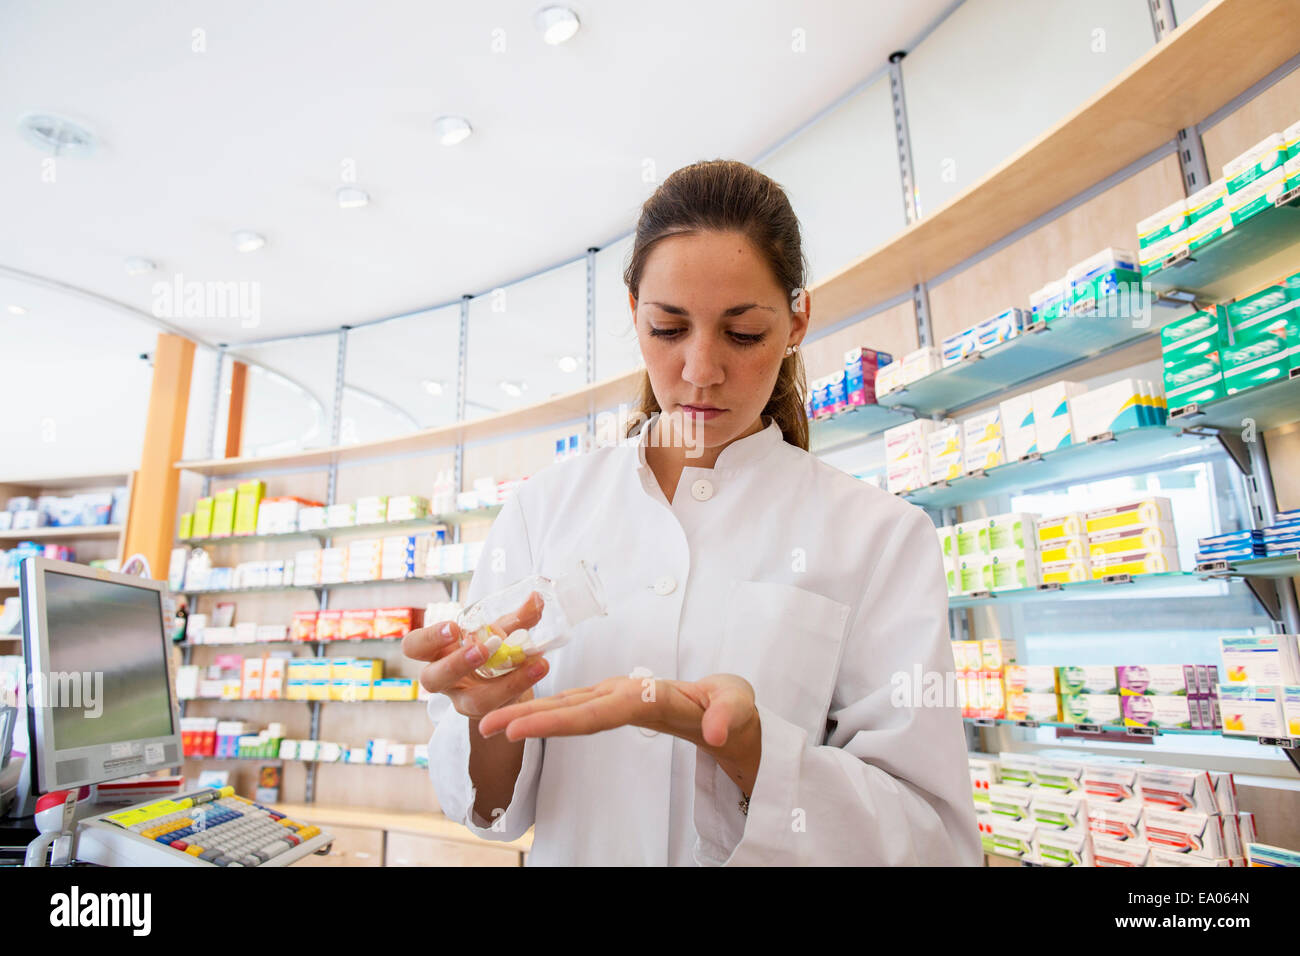 Pharmacist in pharmacy holding medicine in hand - Stock Image